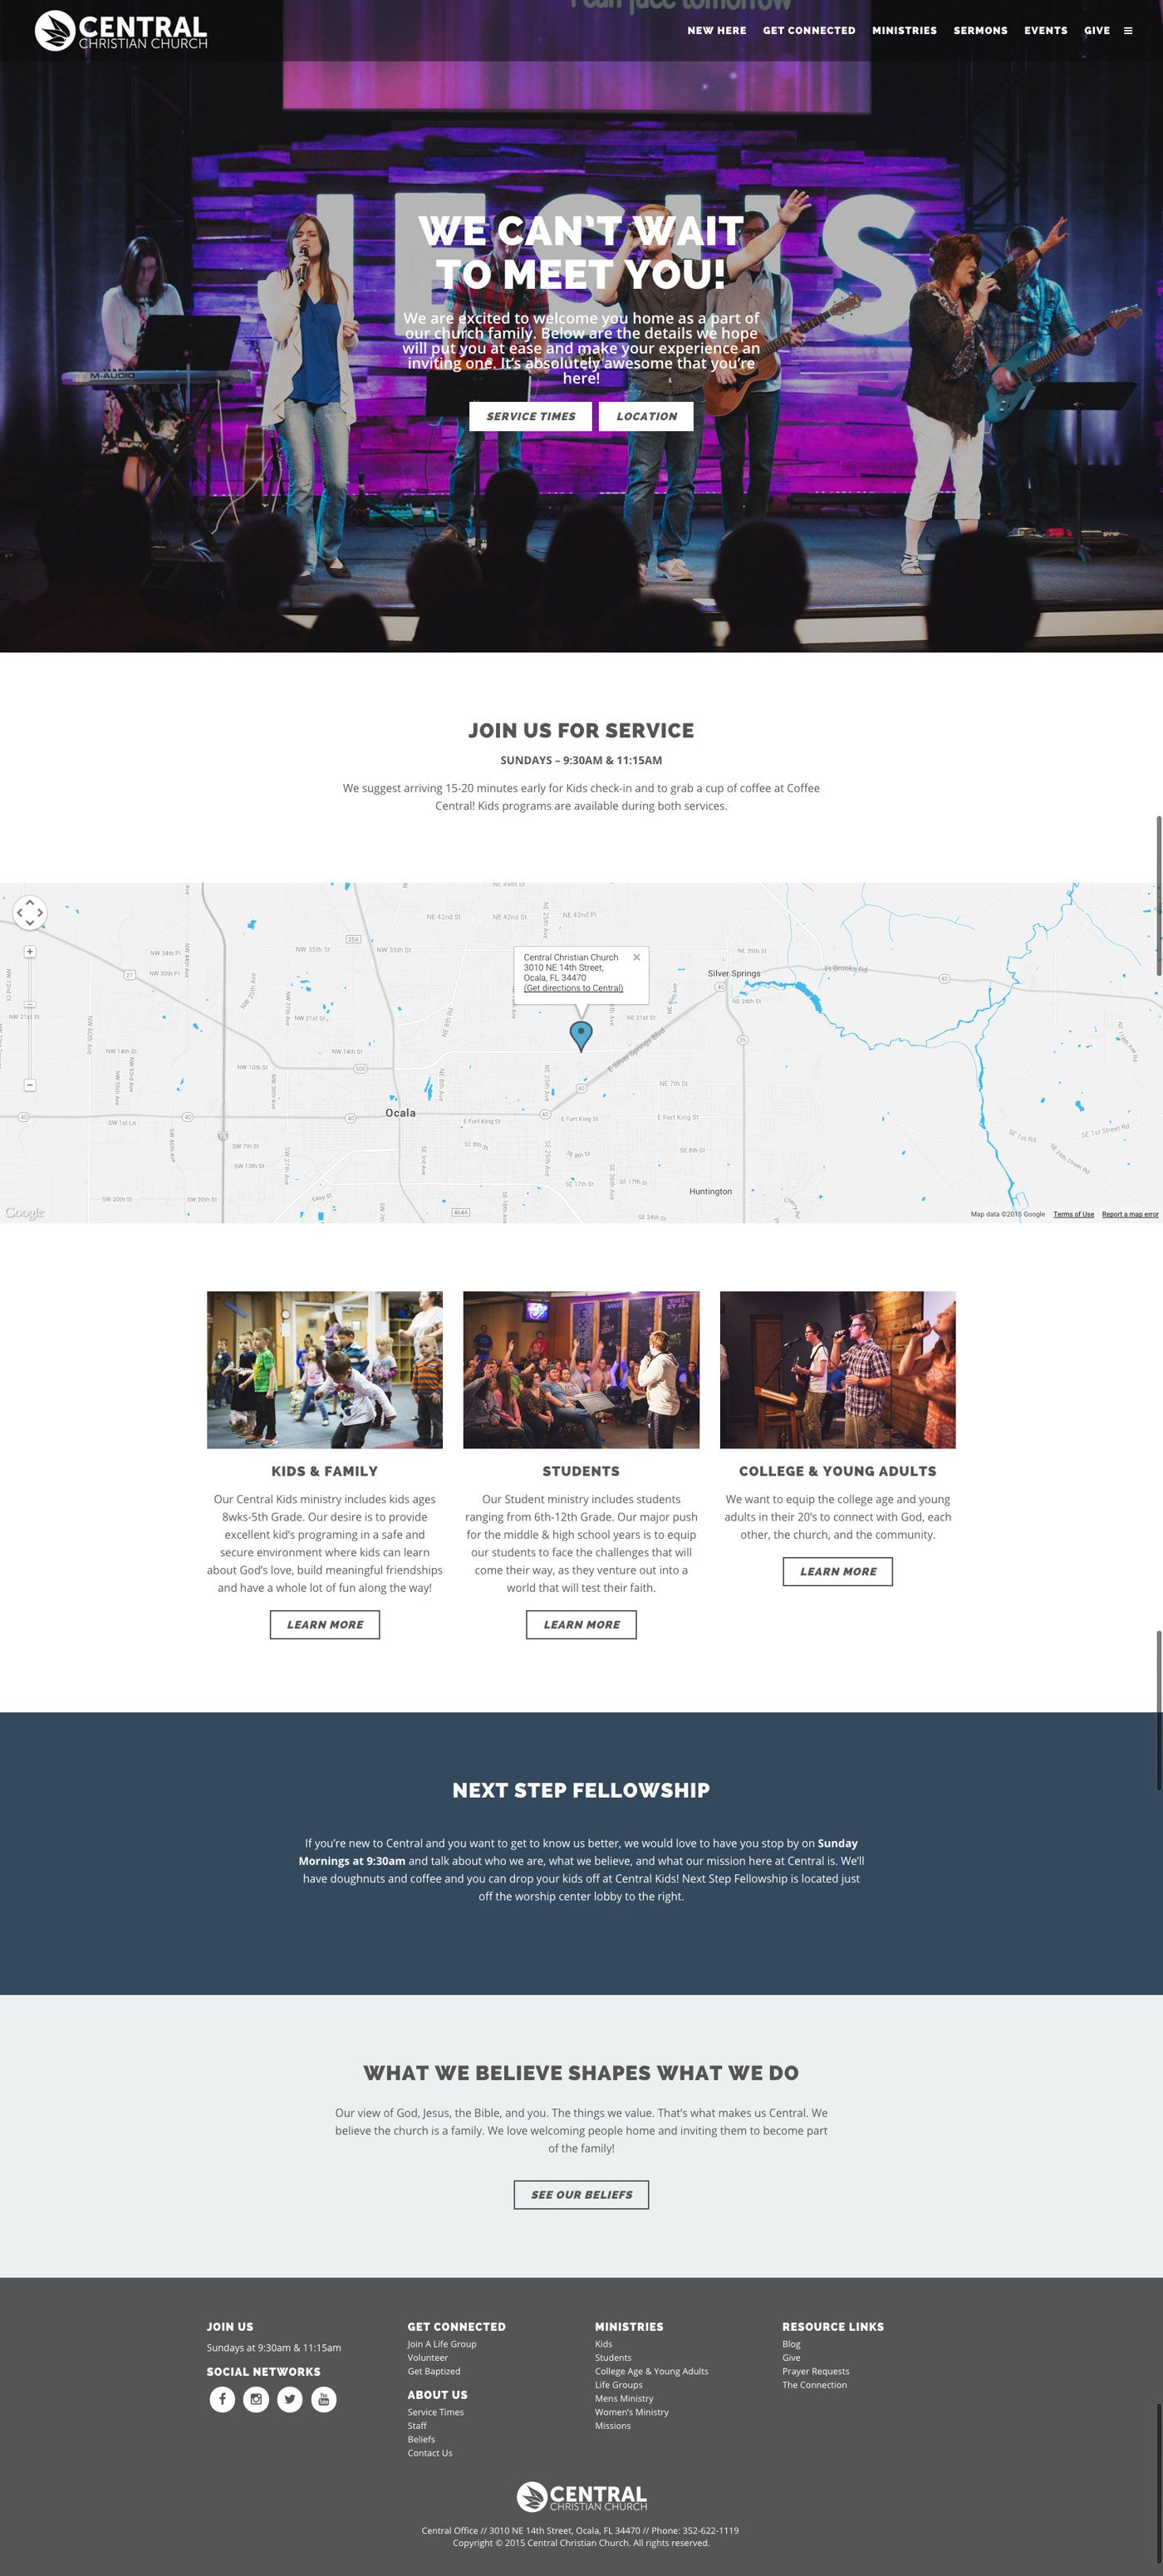 New Here Church Website Design Ideas Central Christian Church Ocala Fl Centralc Church Website Design Website Design Inspiration Web Design Inspiration